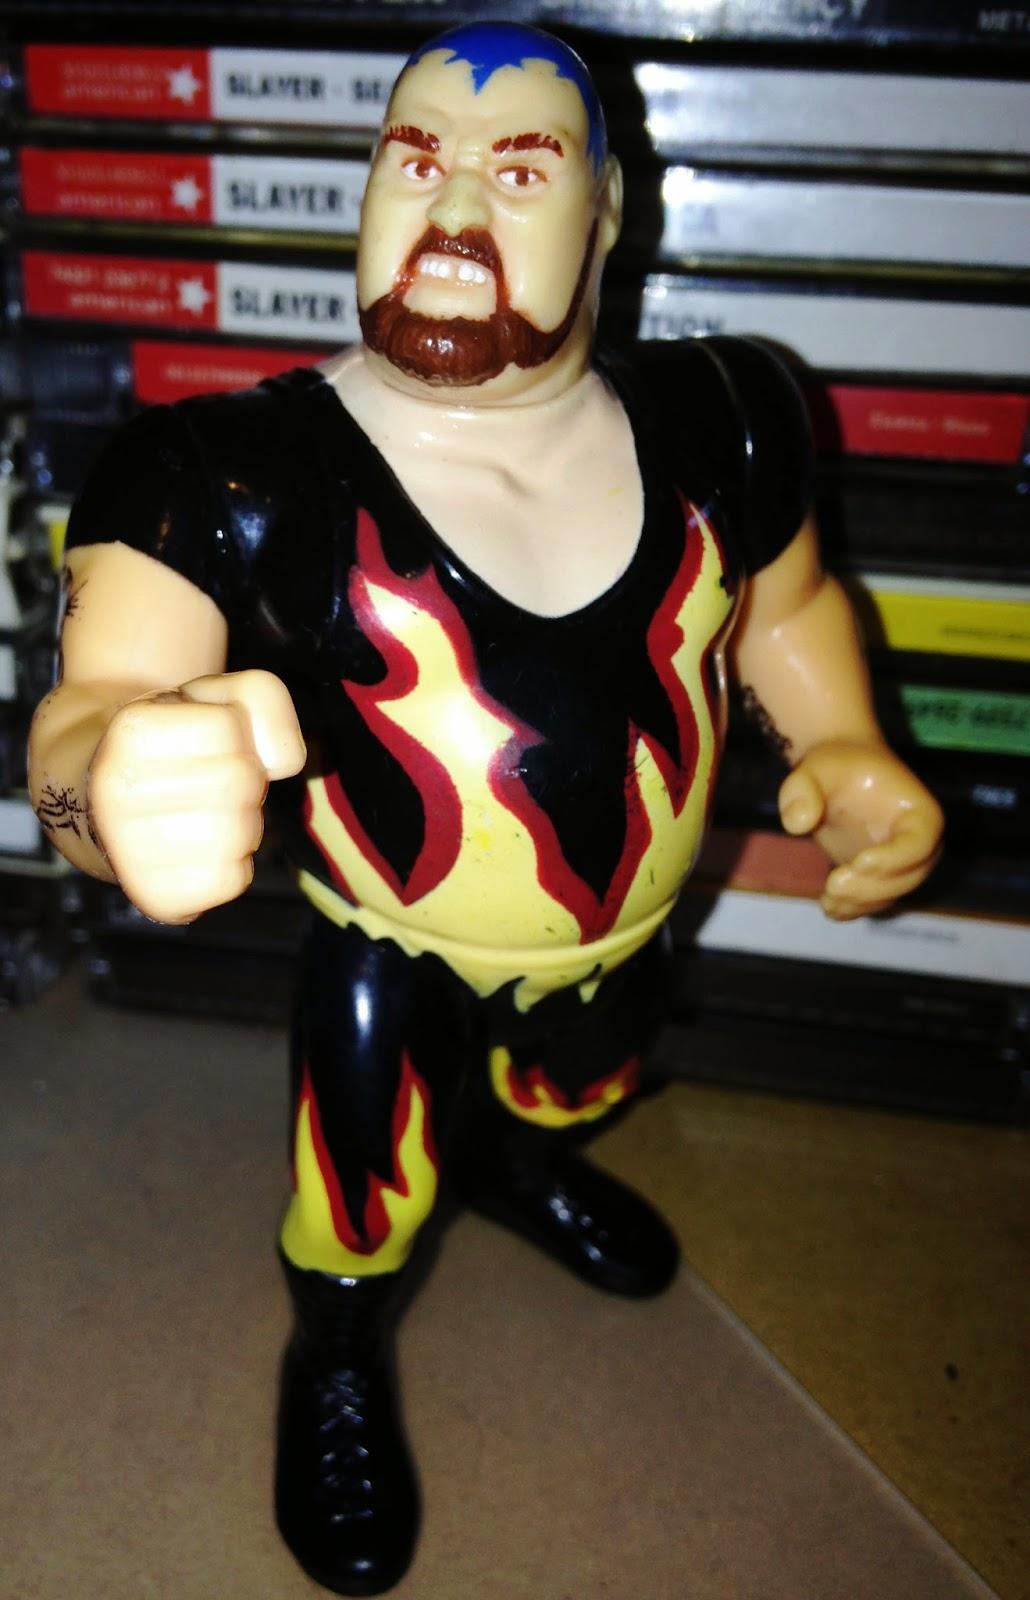 WWF Hasbro Figures - Bam Bam Bigelow